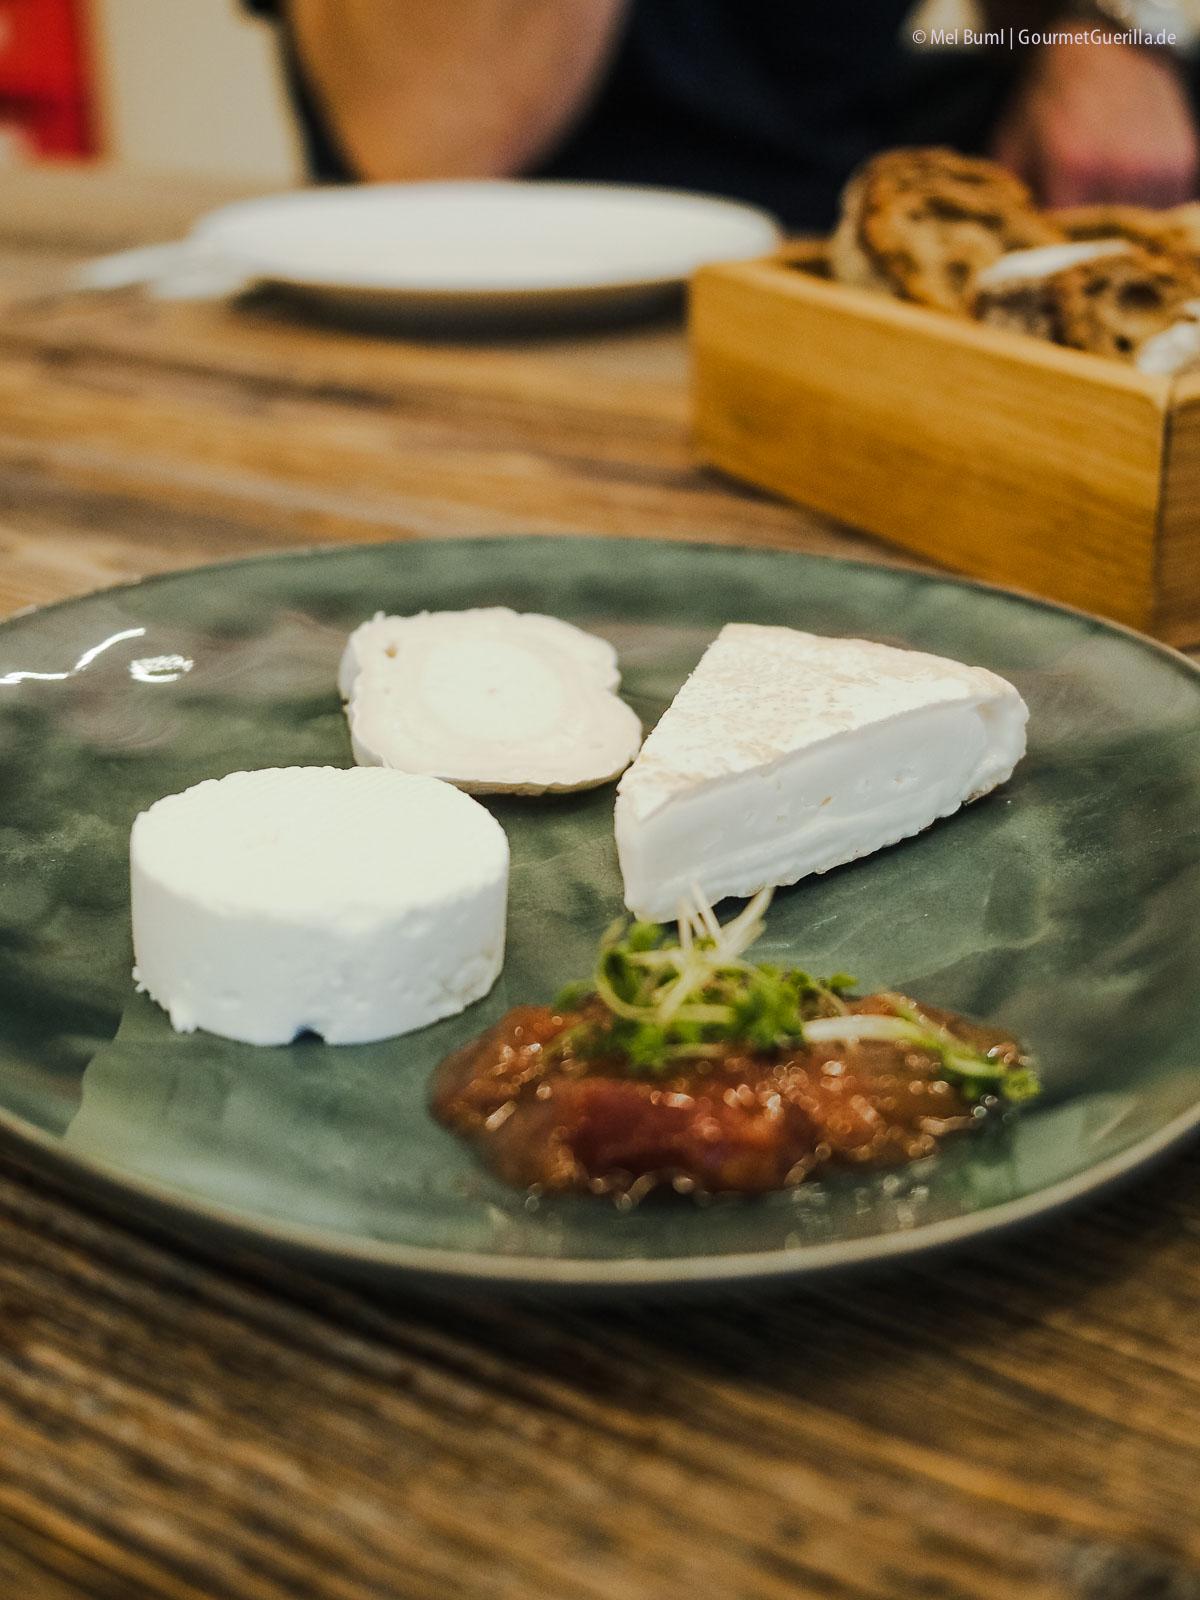 Käse aus Wiens einziger Stadtkäserei Lingenhel |GourmetGuerilla.de